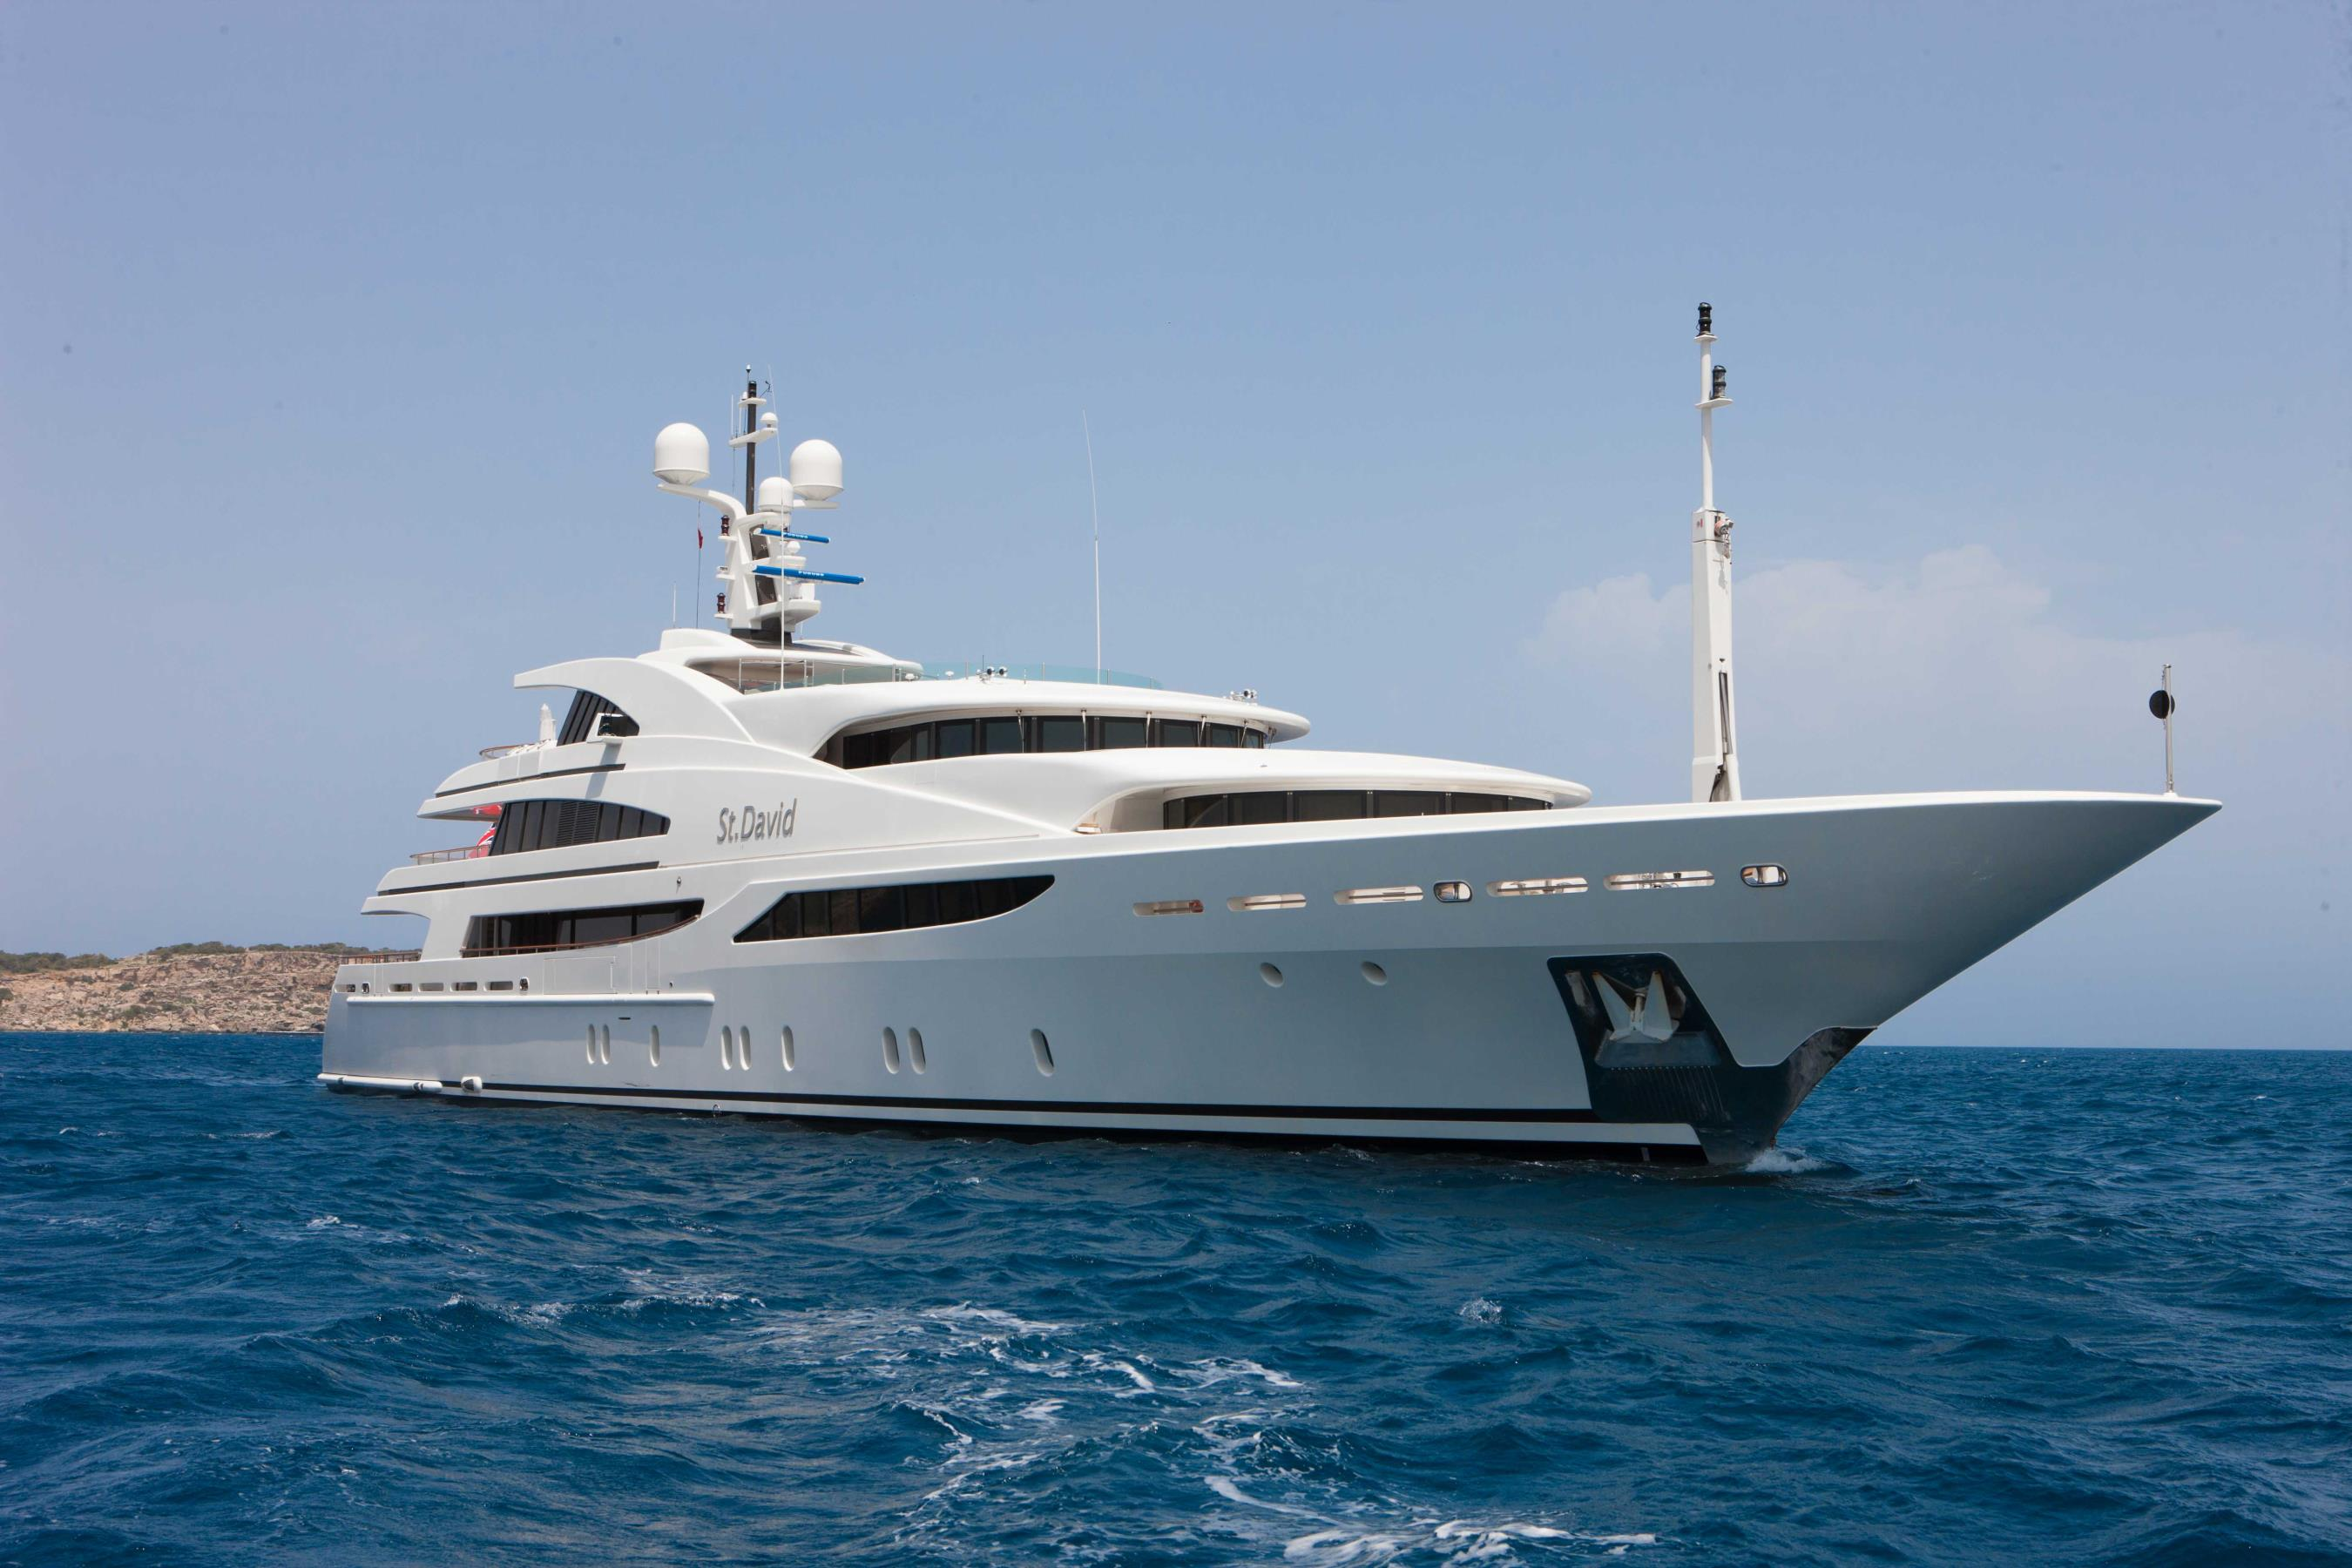 ST DAVID Yacht Charter Details, Benetti Yacht ...